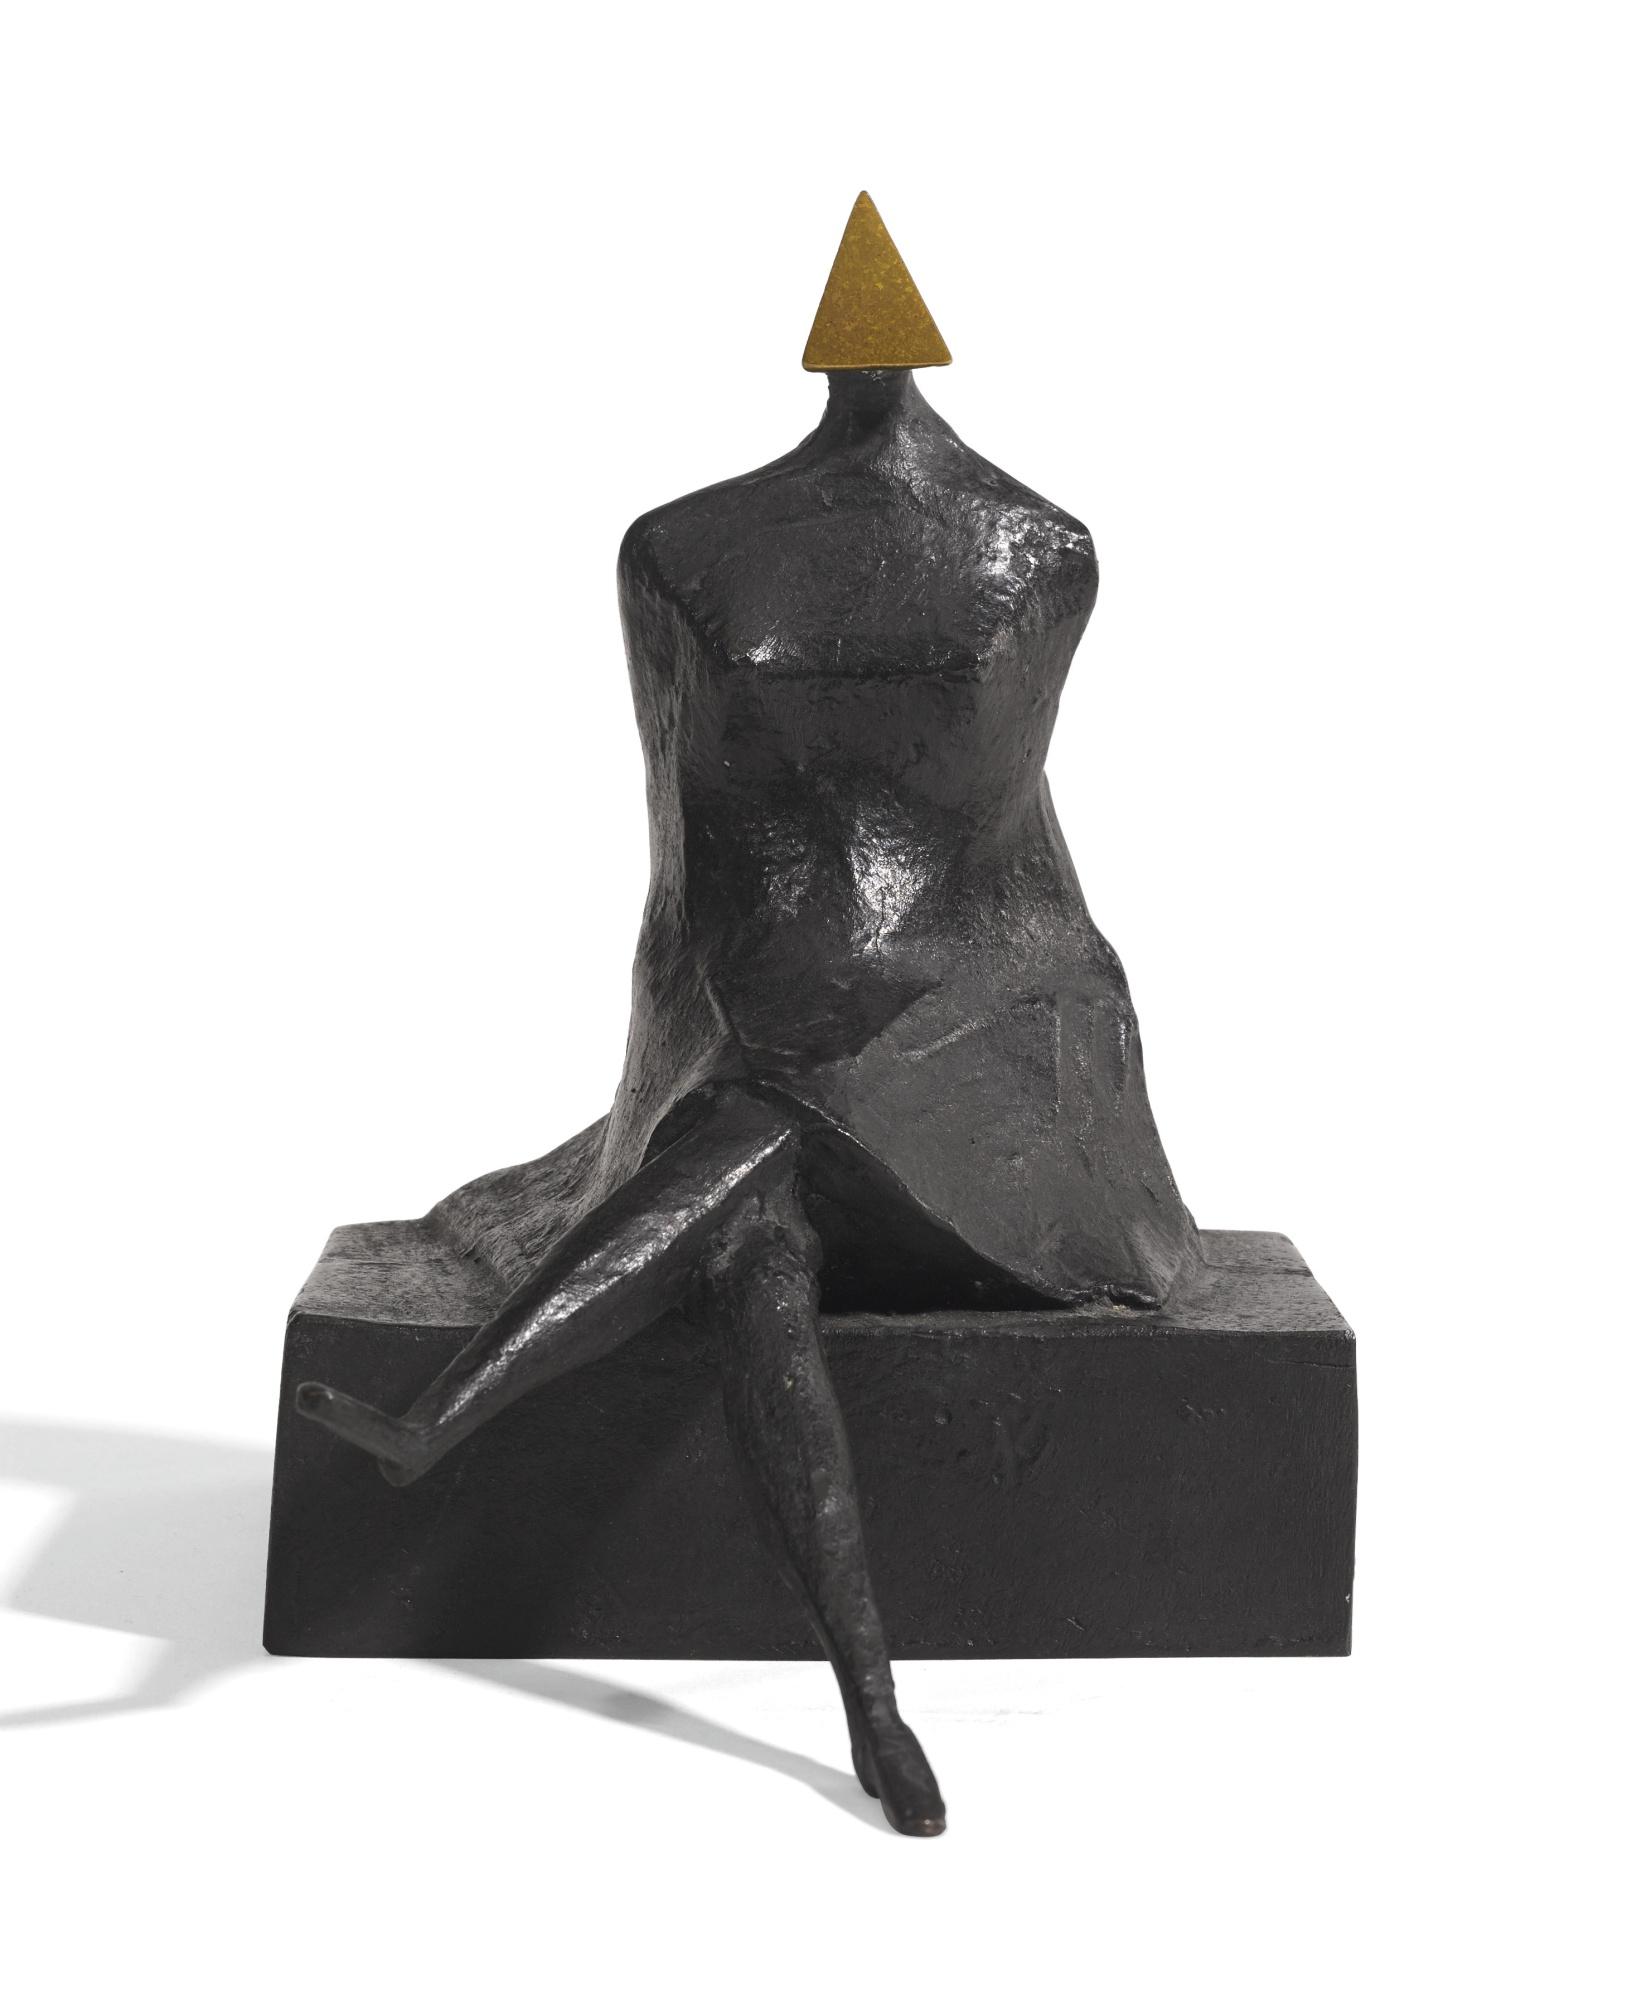 Lynn Chadwick-Maquette VII Sitting Woman-1986